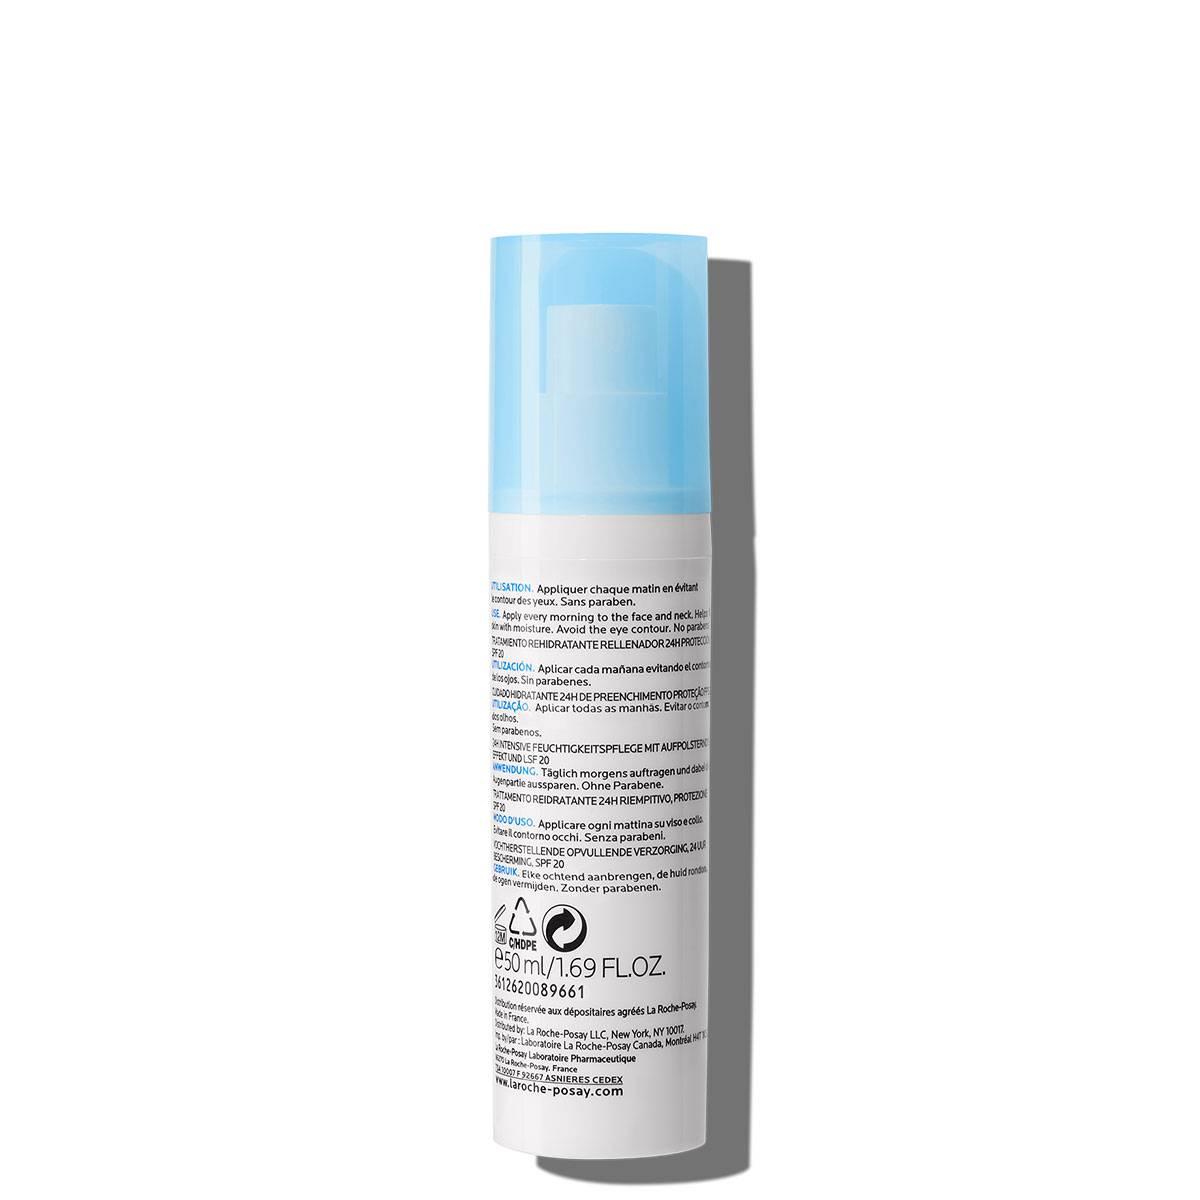 La Roche Posay ProduktSide Hydraphase UV Intense Light Spf20 50ml 3337